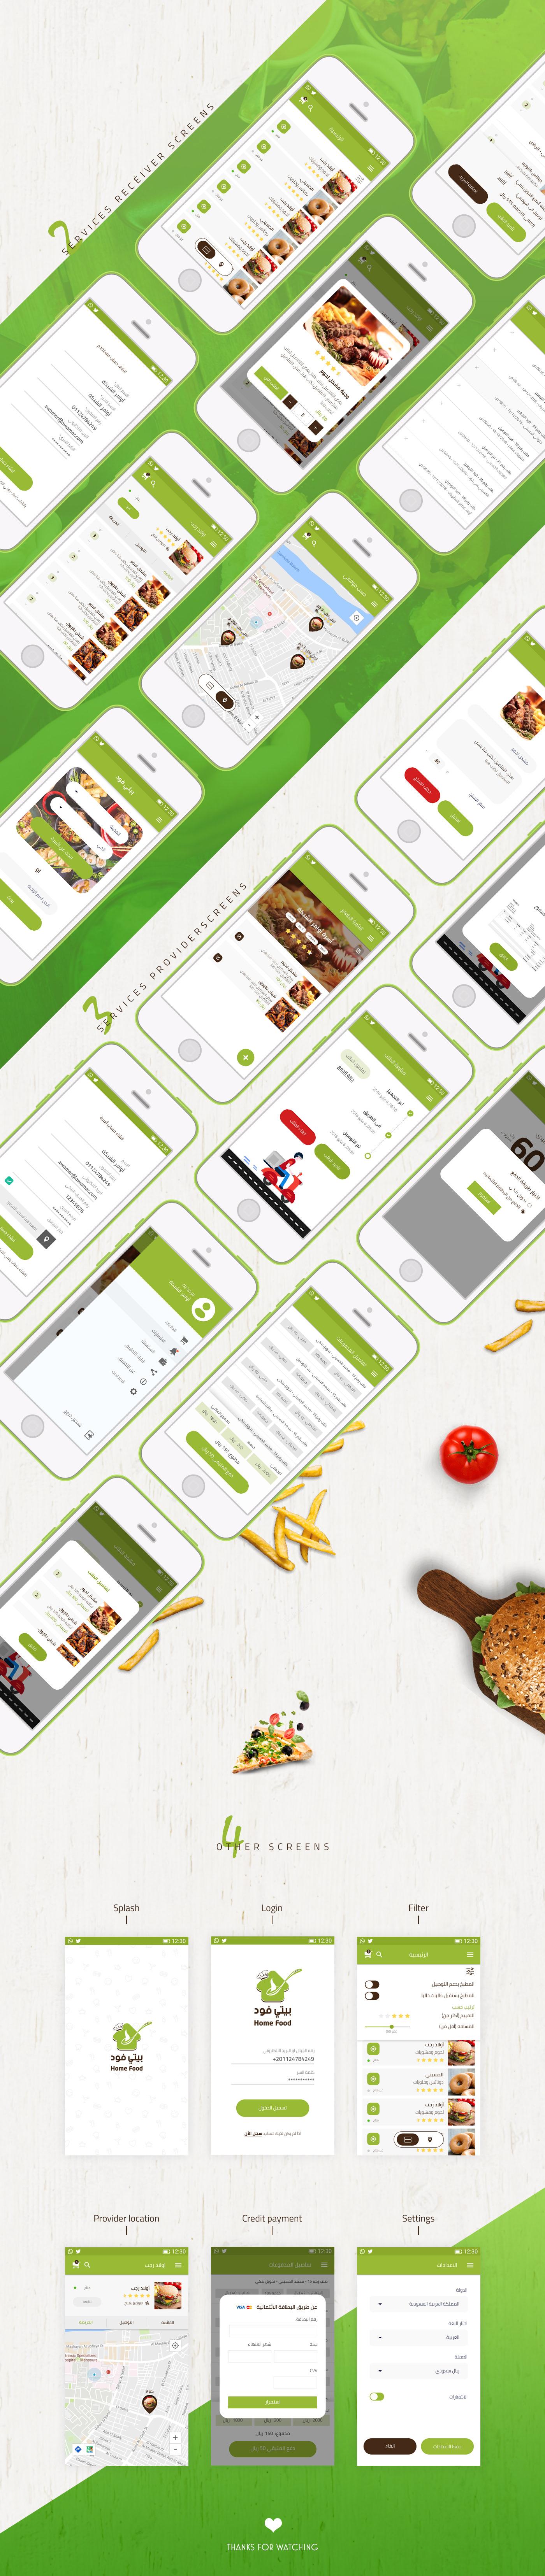 UI ui design Mobile app android programming  design food app Food  ui ux creative